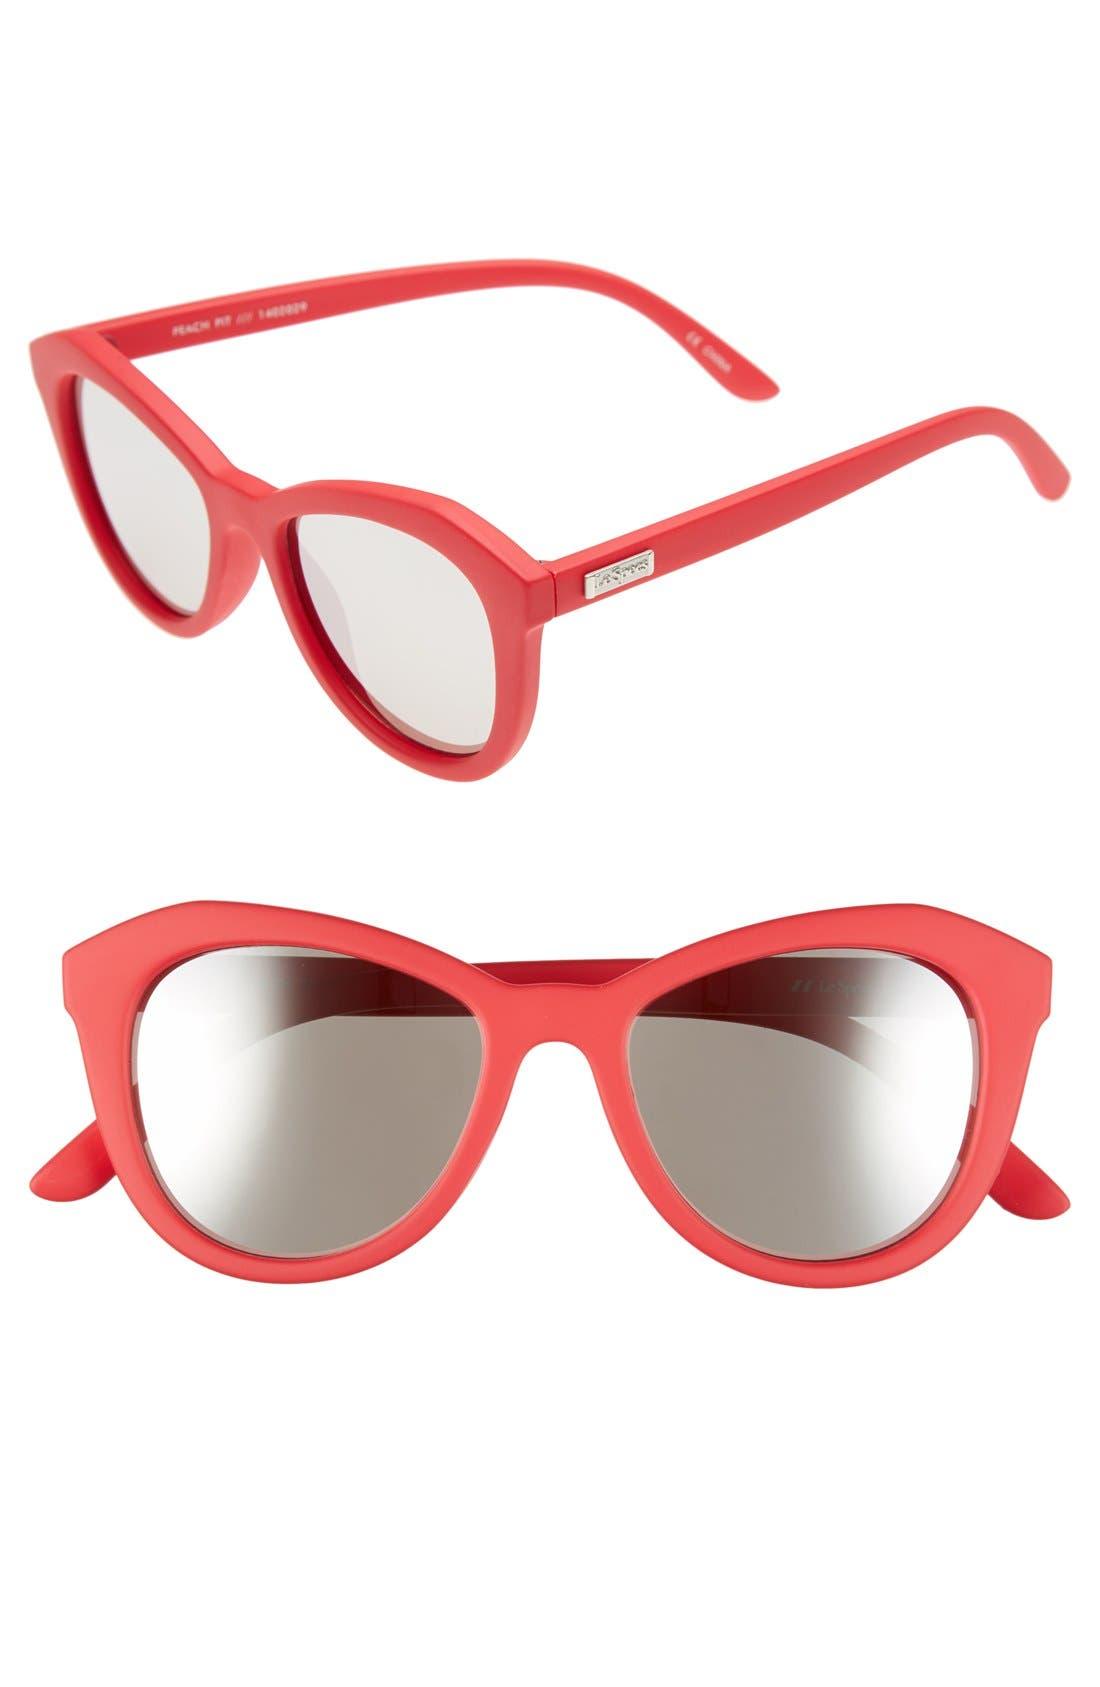 Alternate Image 1 Selected - Le Specs 'Peach Pit' 52mm Cat Eye Sunglasses